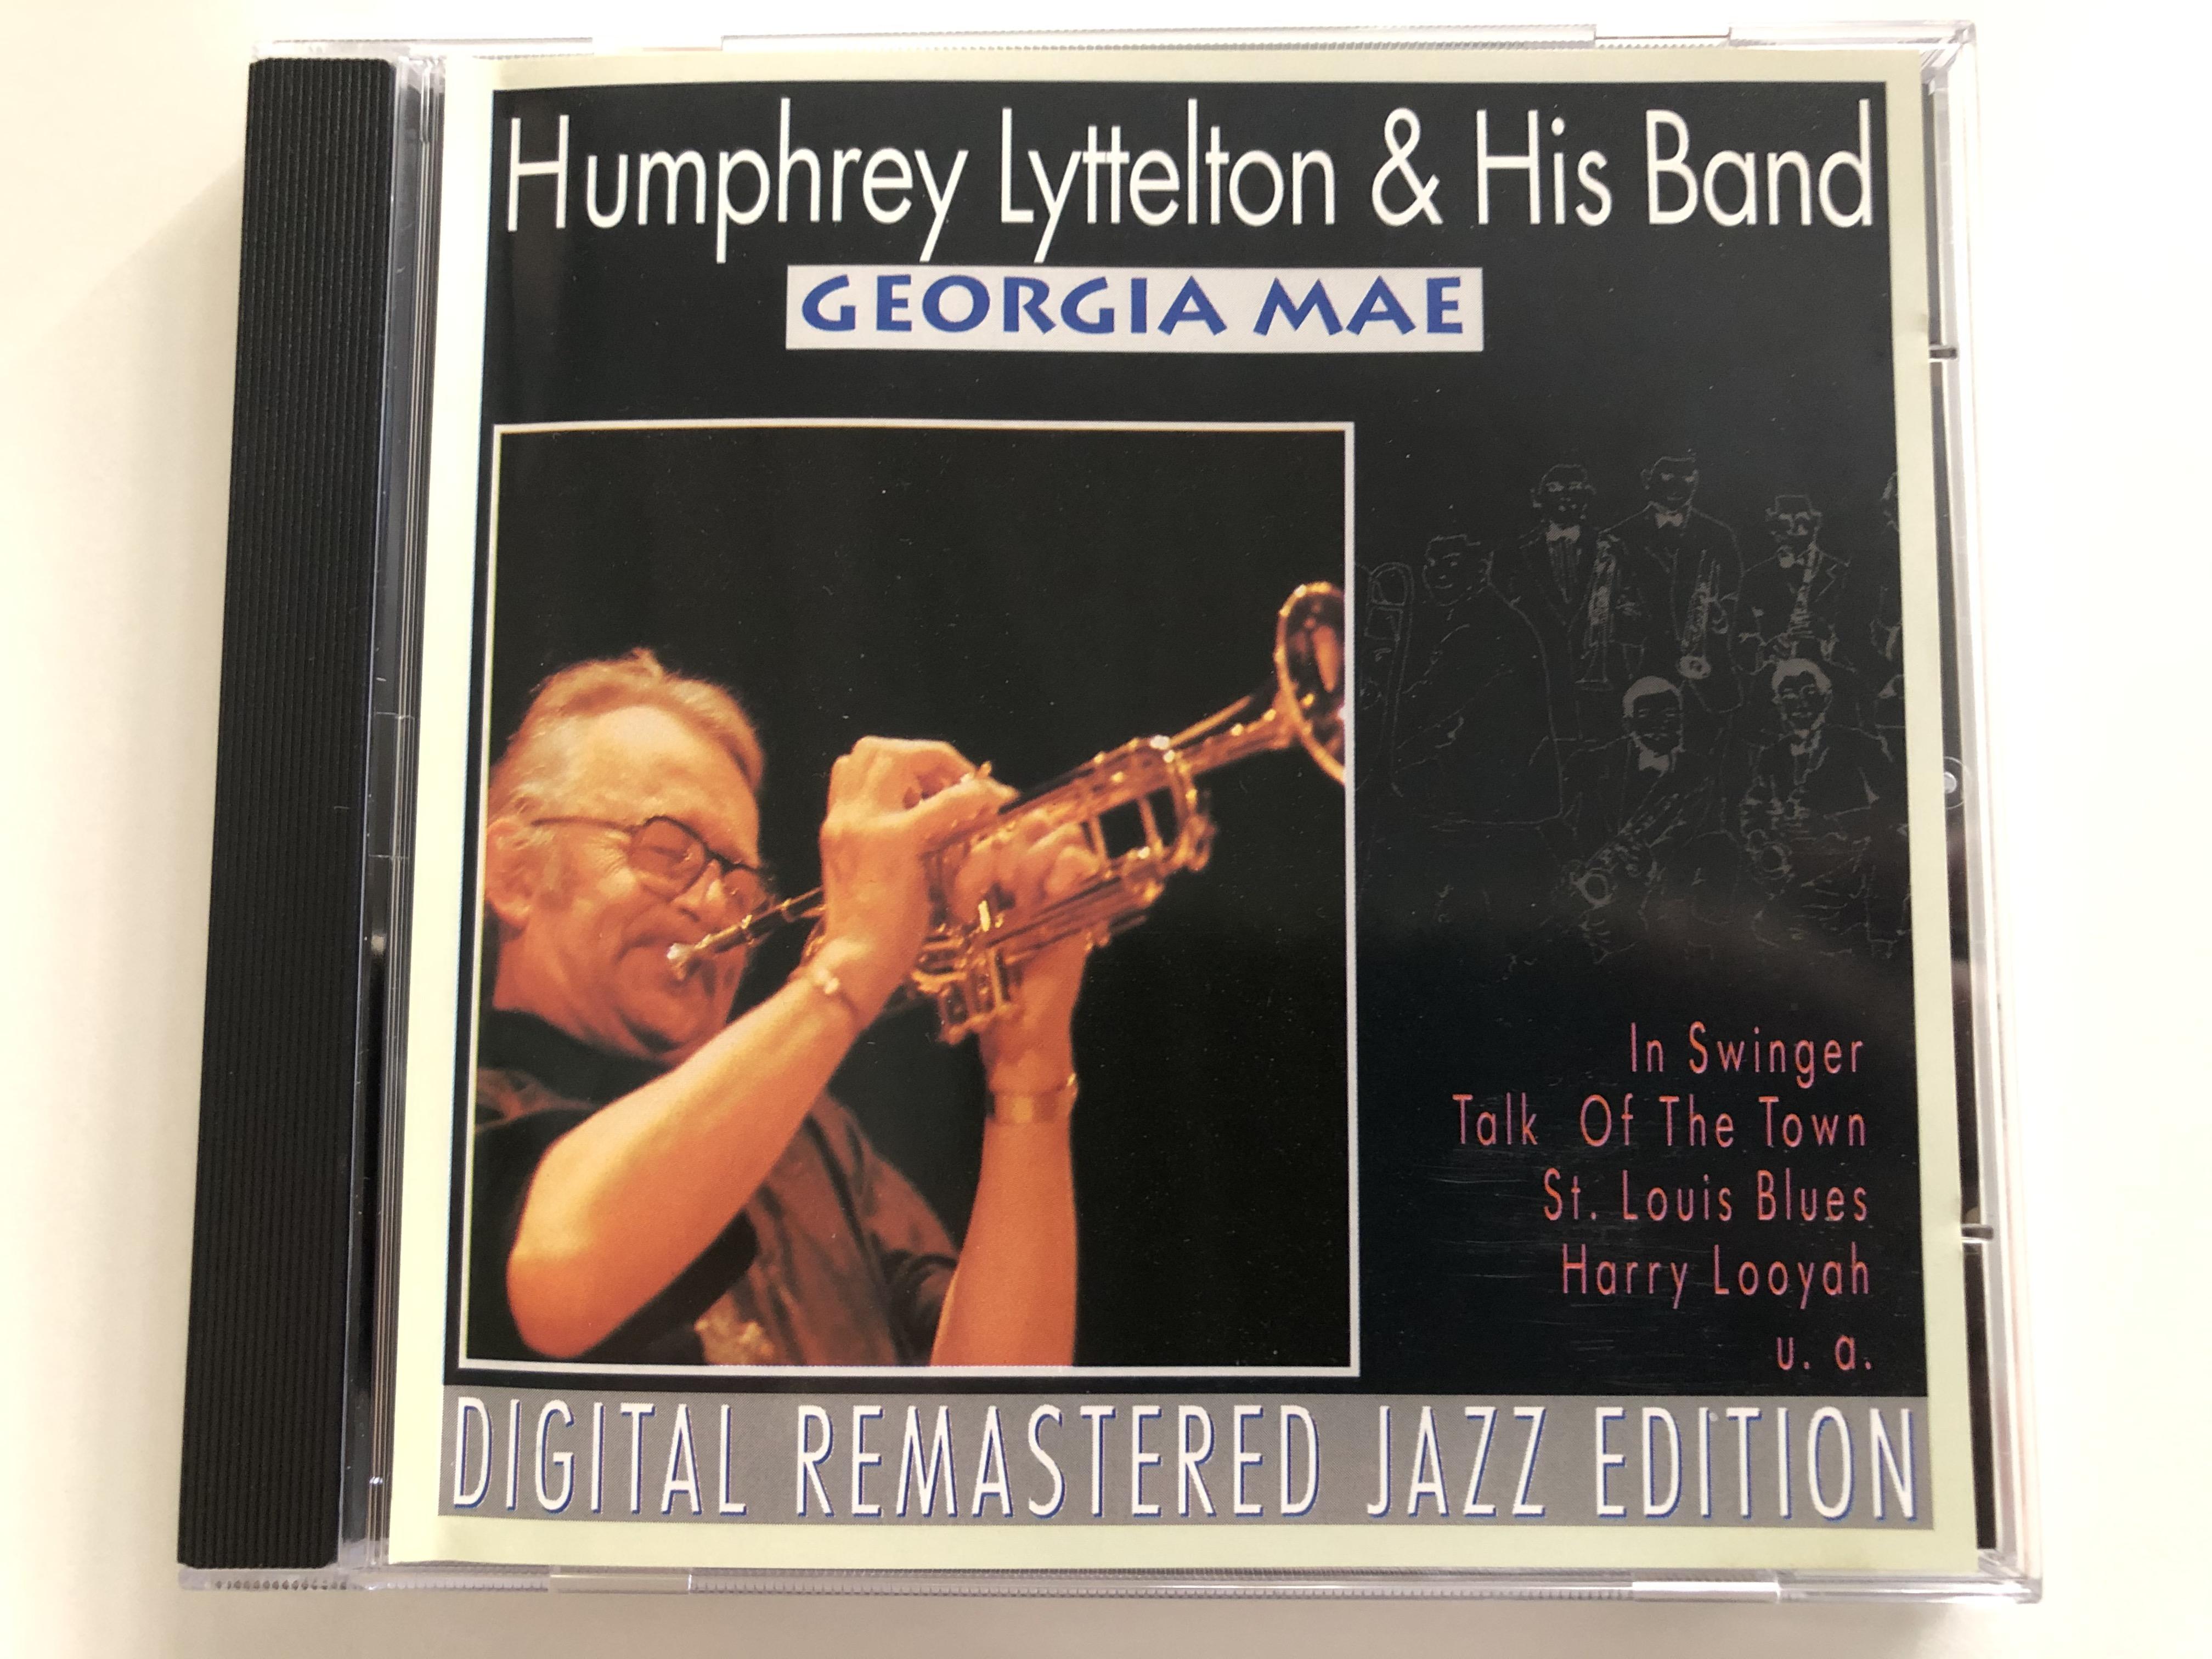 humphrey-lyttelton-his-band-georgia-mae-in-swinger-talk-of-the-town-st.-louis-blues-harry-looyah-u.a.-digital-remastered-jazz-edition-pastels-audio-cd-1995-cd-20-1-.jpg